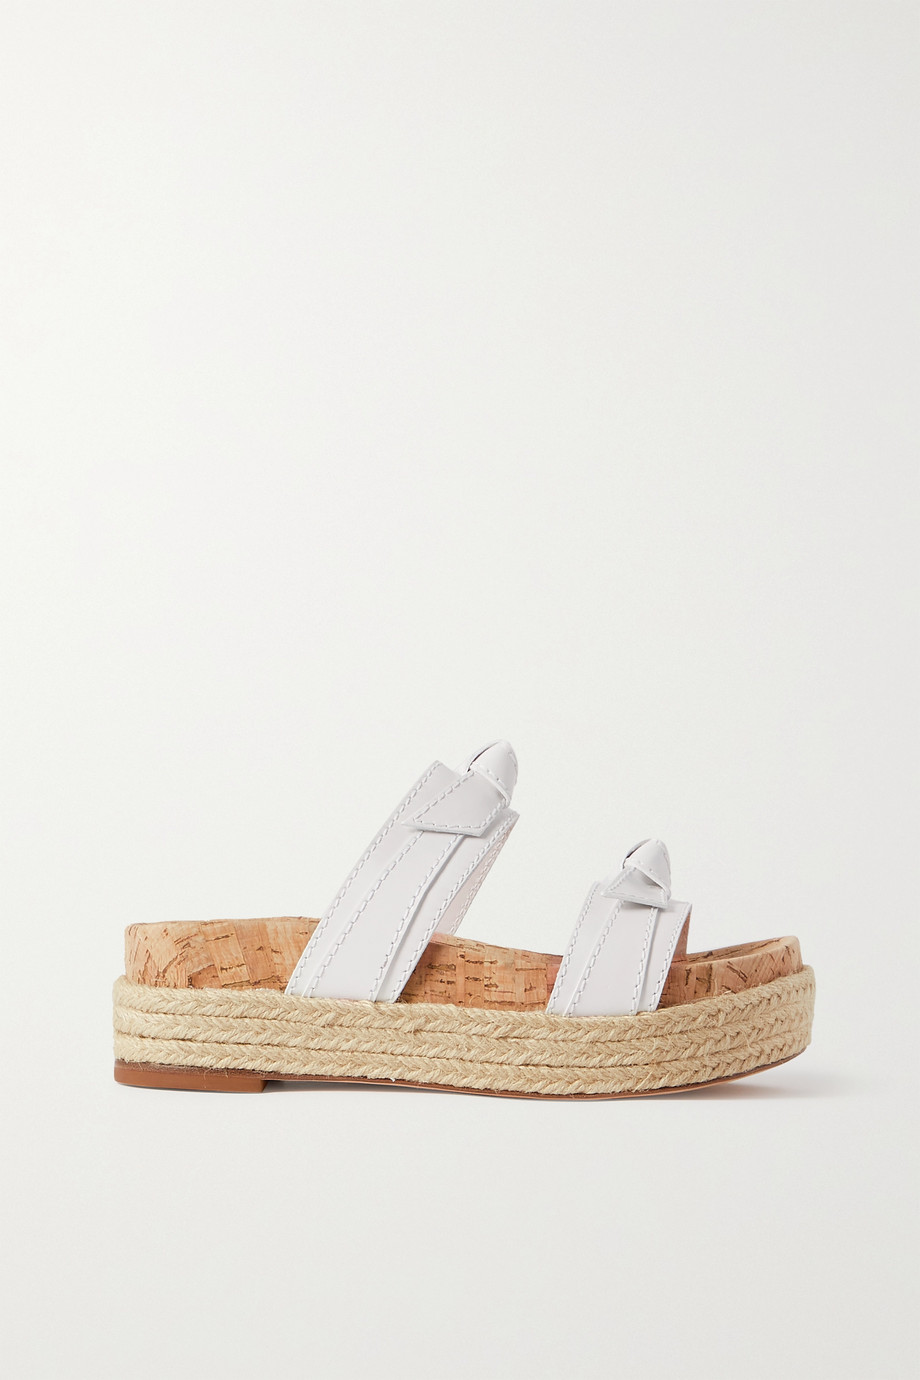 Alexandre Birman Clarita Sport leather espadrille platform sandals